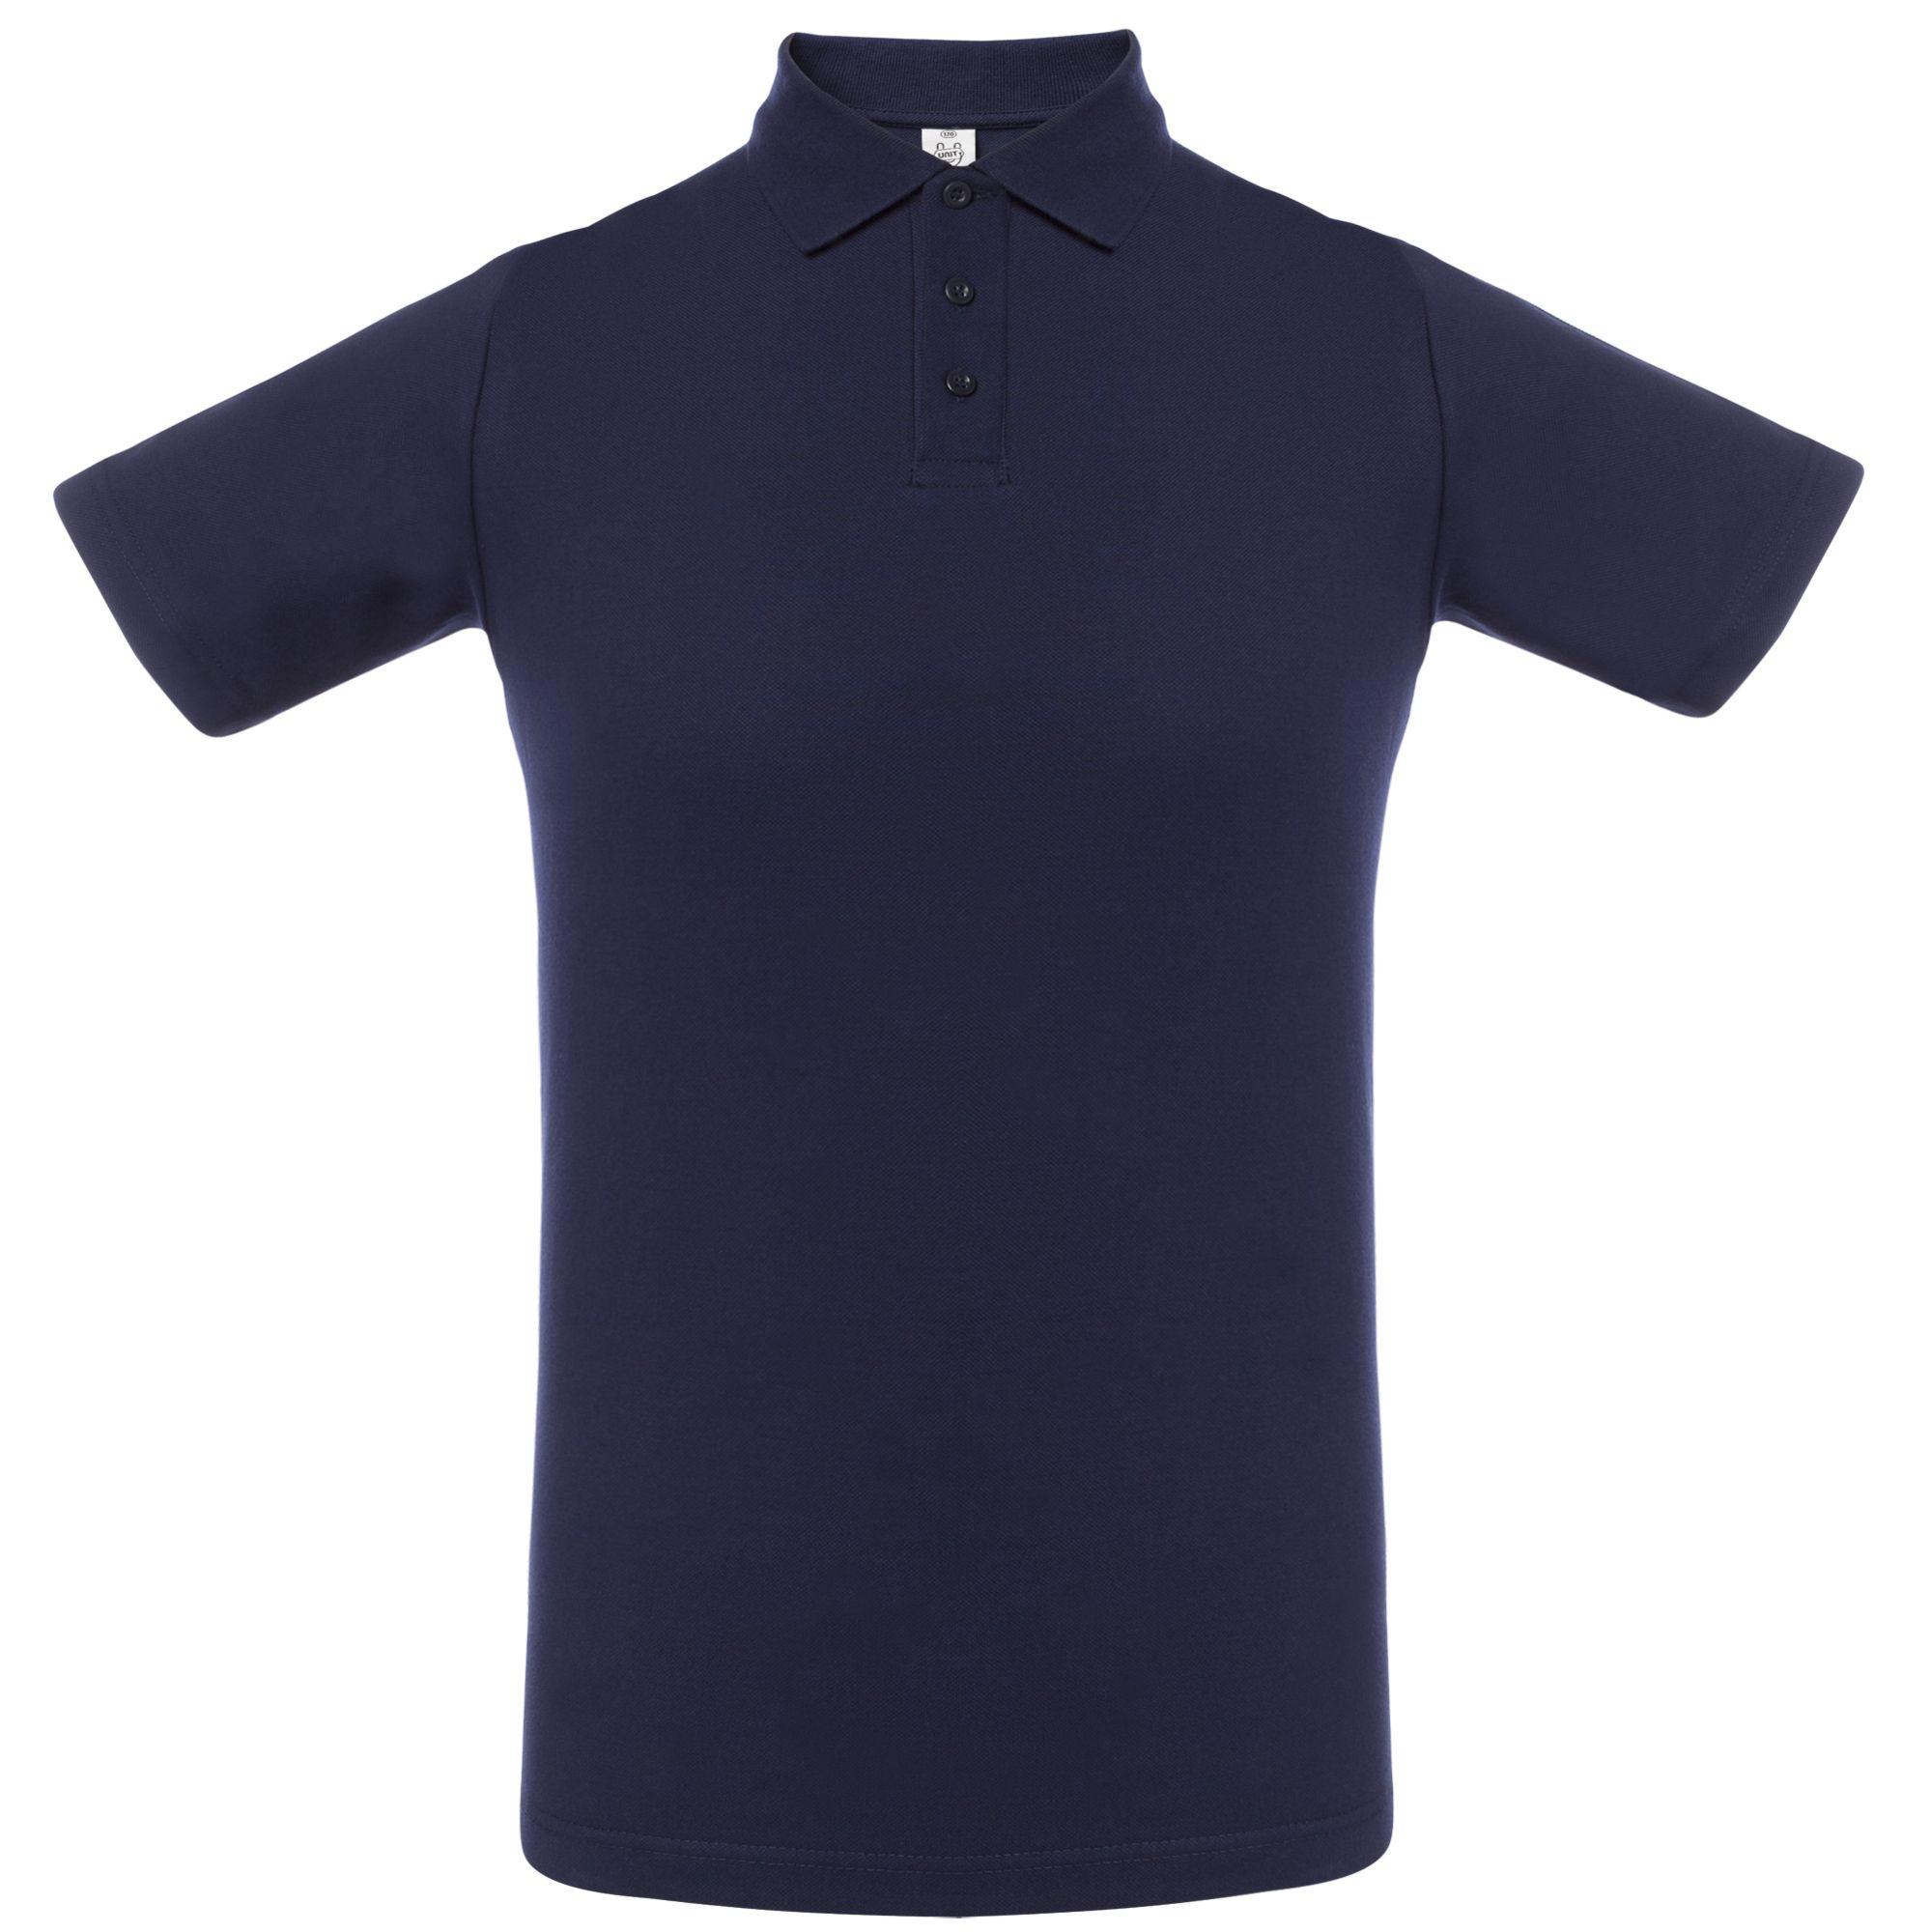 Рубашка поло Virma Light, темно-синяя (navy)